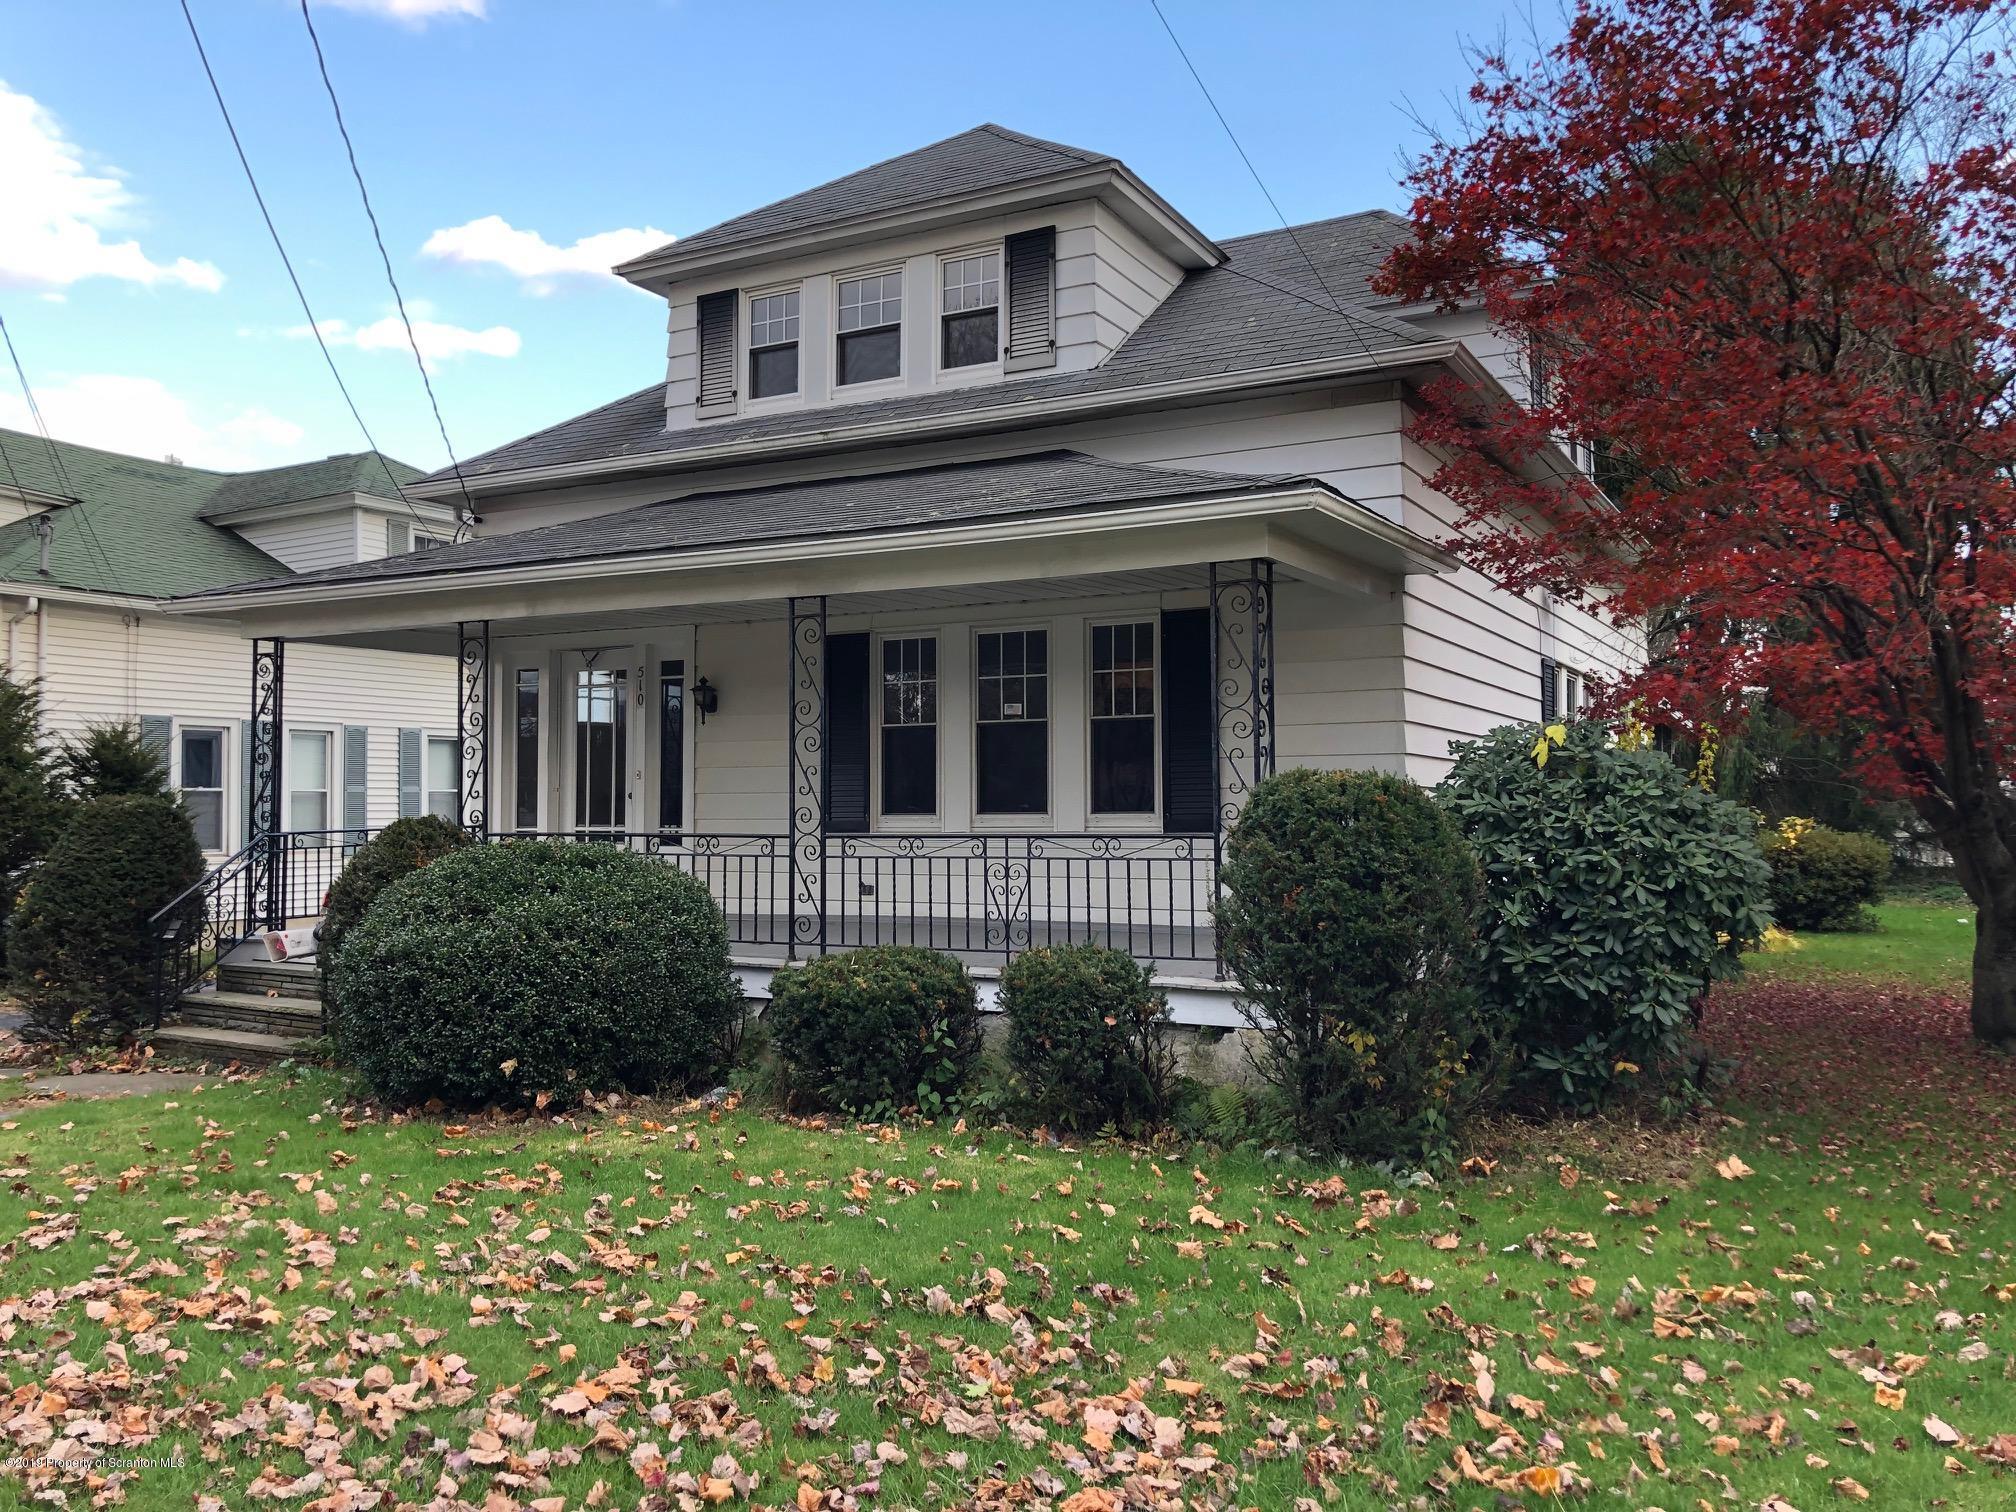 510 Keyser Ave, Taylor, Pennsylvania 18517, 3 Bedrooms Bedrooms, 7 Rooms Rooms,2 BathroomsBathrooms,Single Family,For Sale,Keyser,19-5269